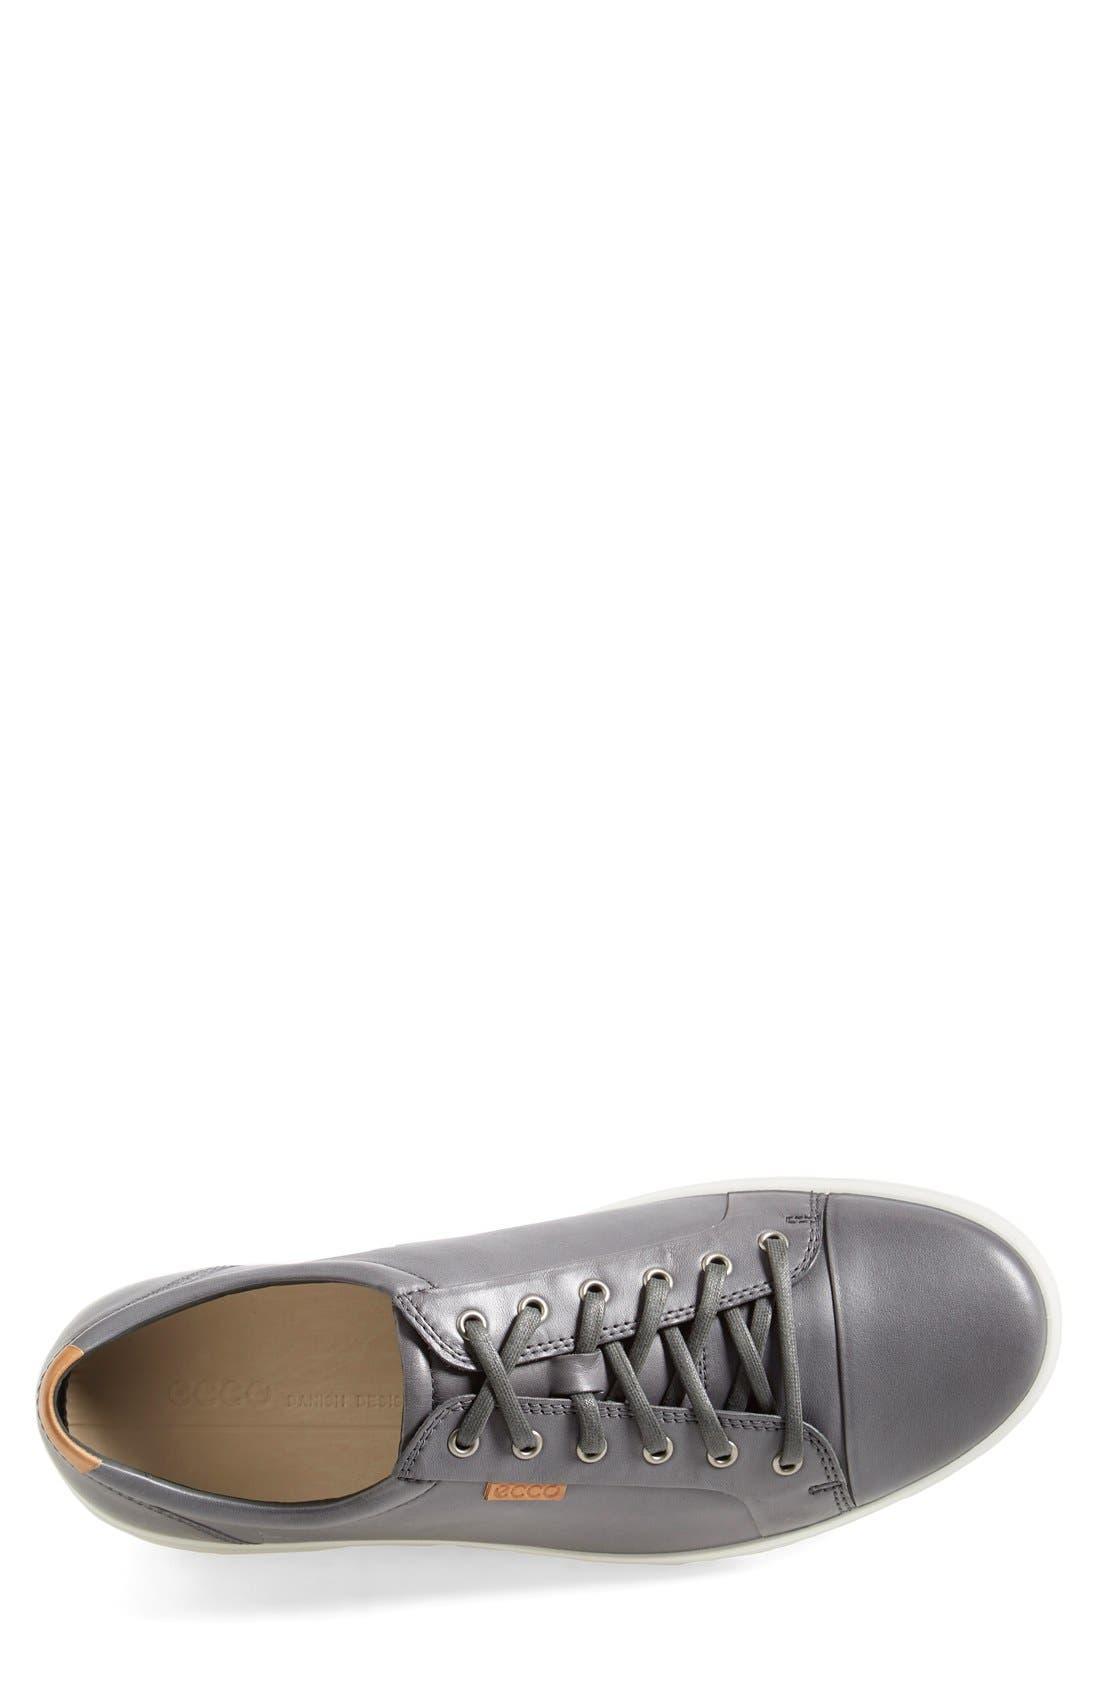 Alternate Image 3  - ECCOSoft VII Lace-Up Sneaker (Men)